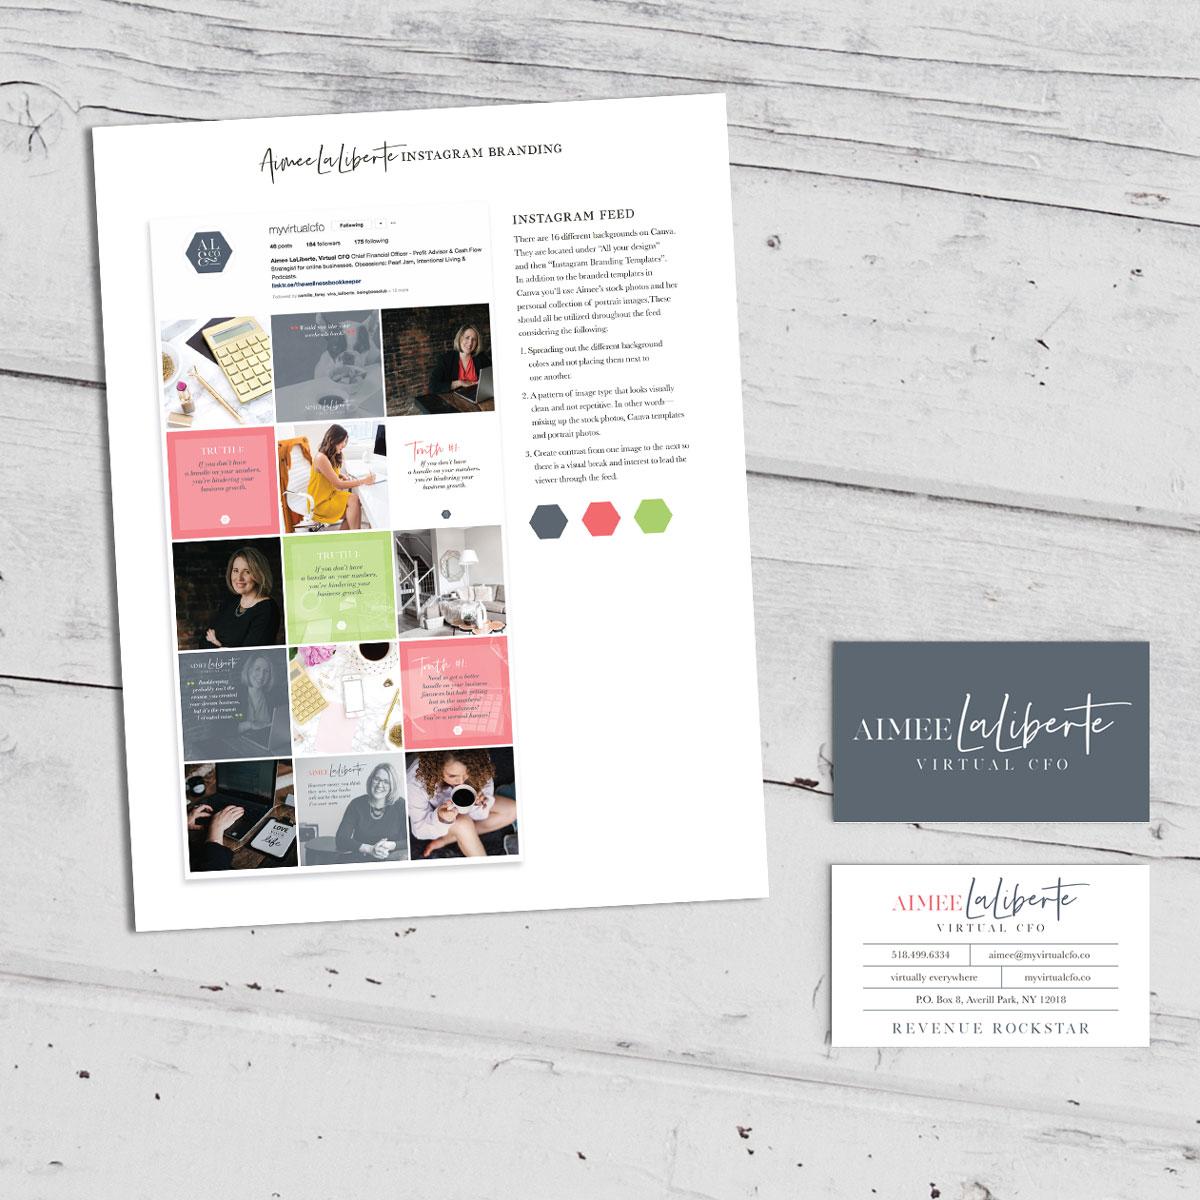 Aimee LaLiberte Social Stye Guide